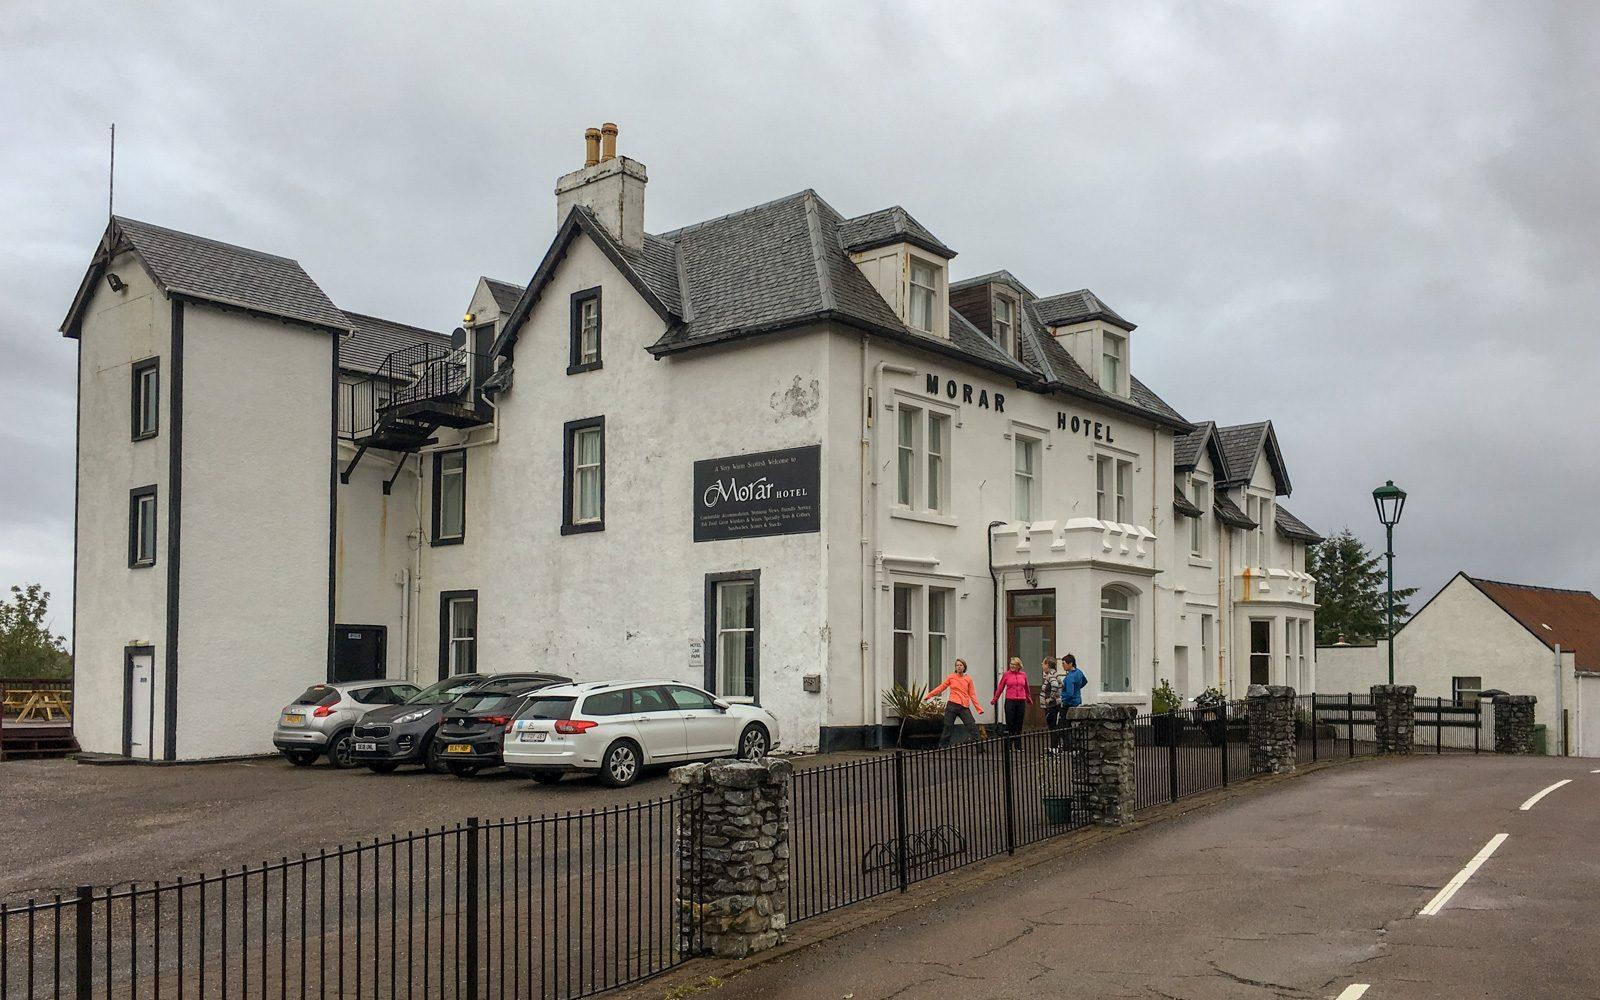 Hotel Moran Scotland